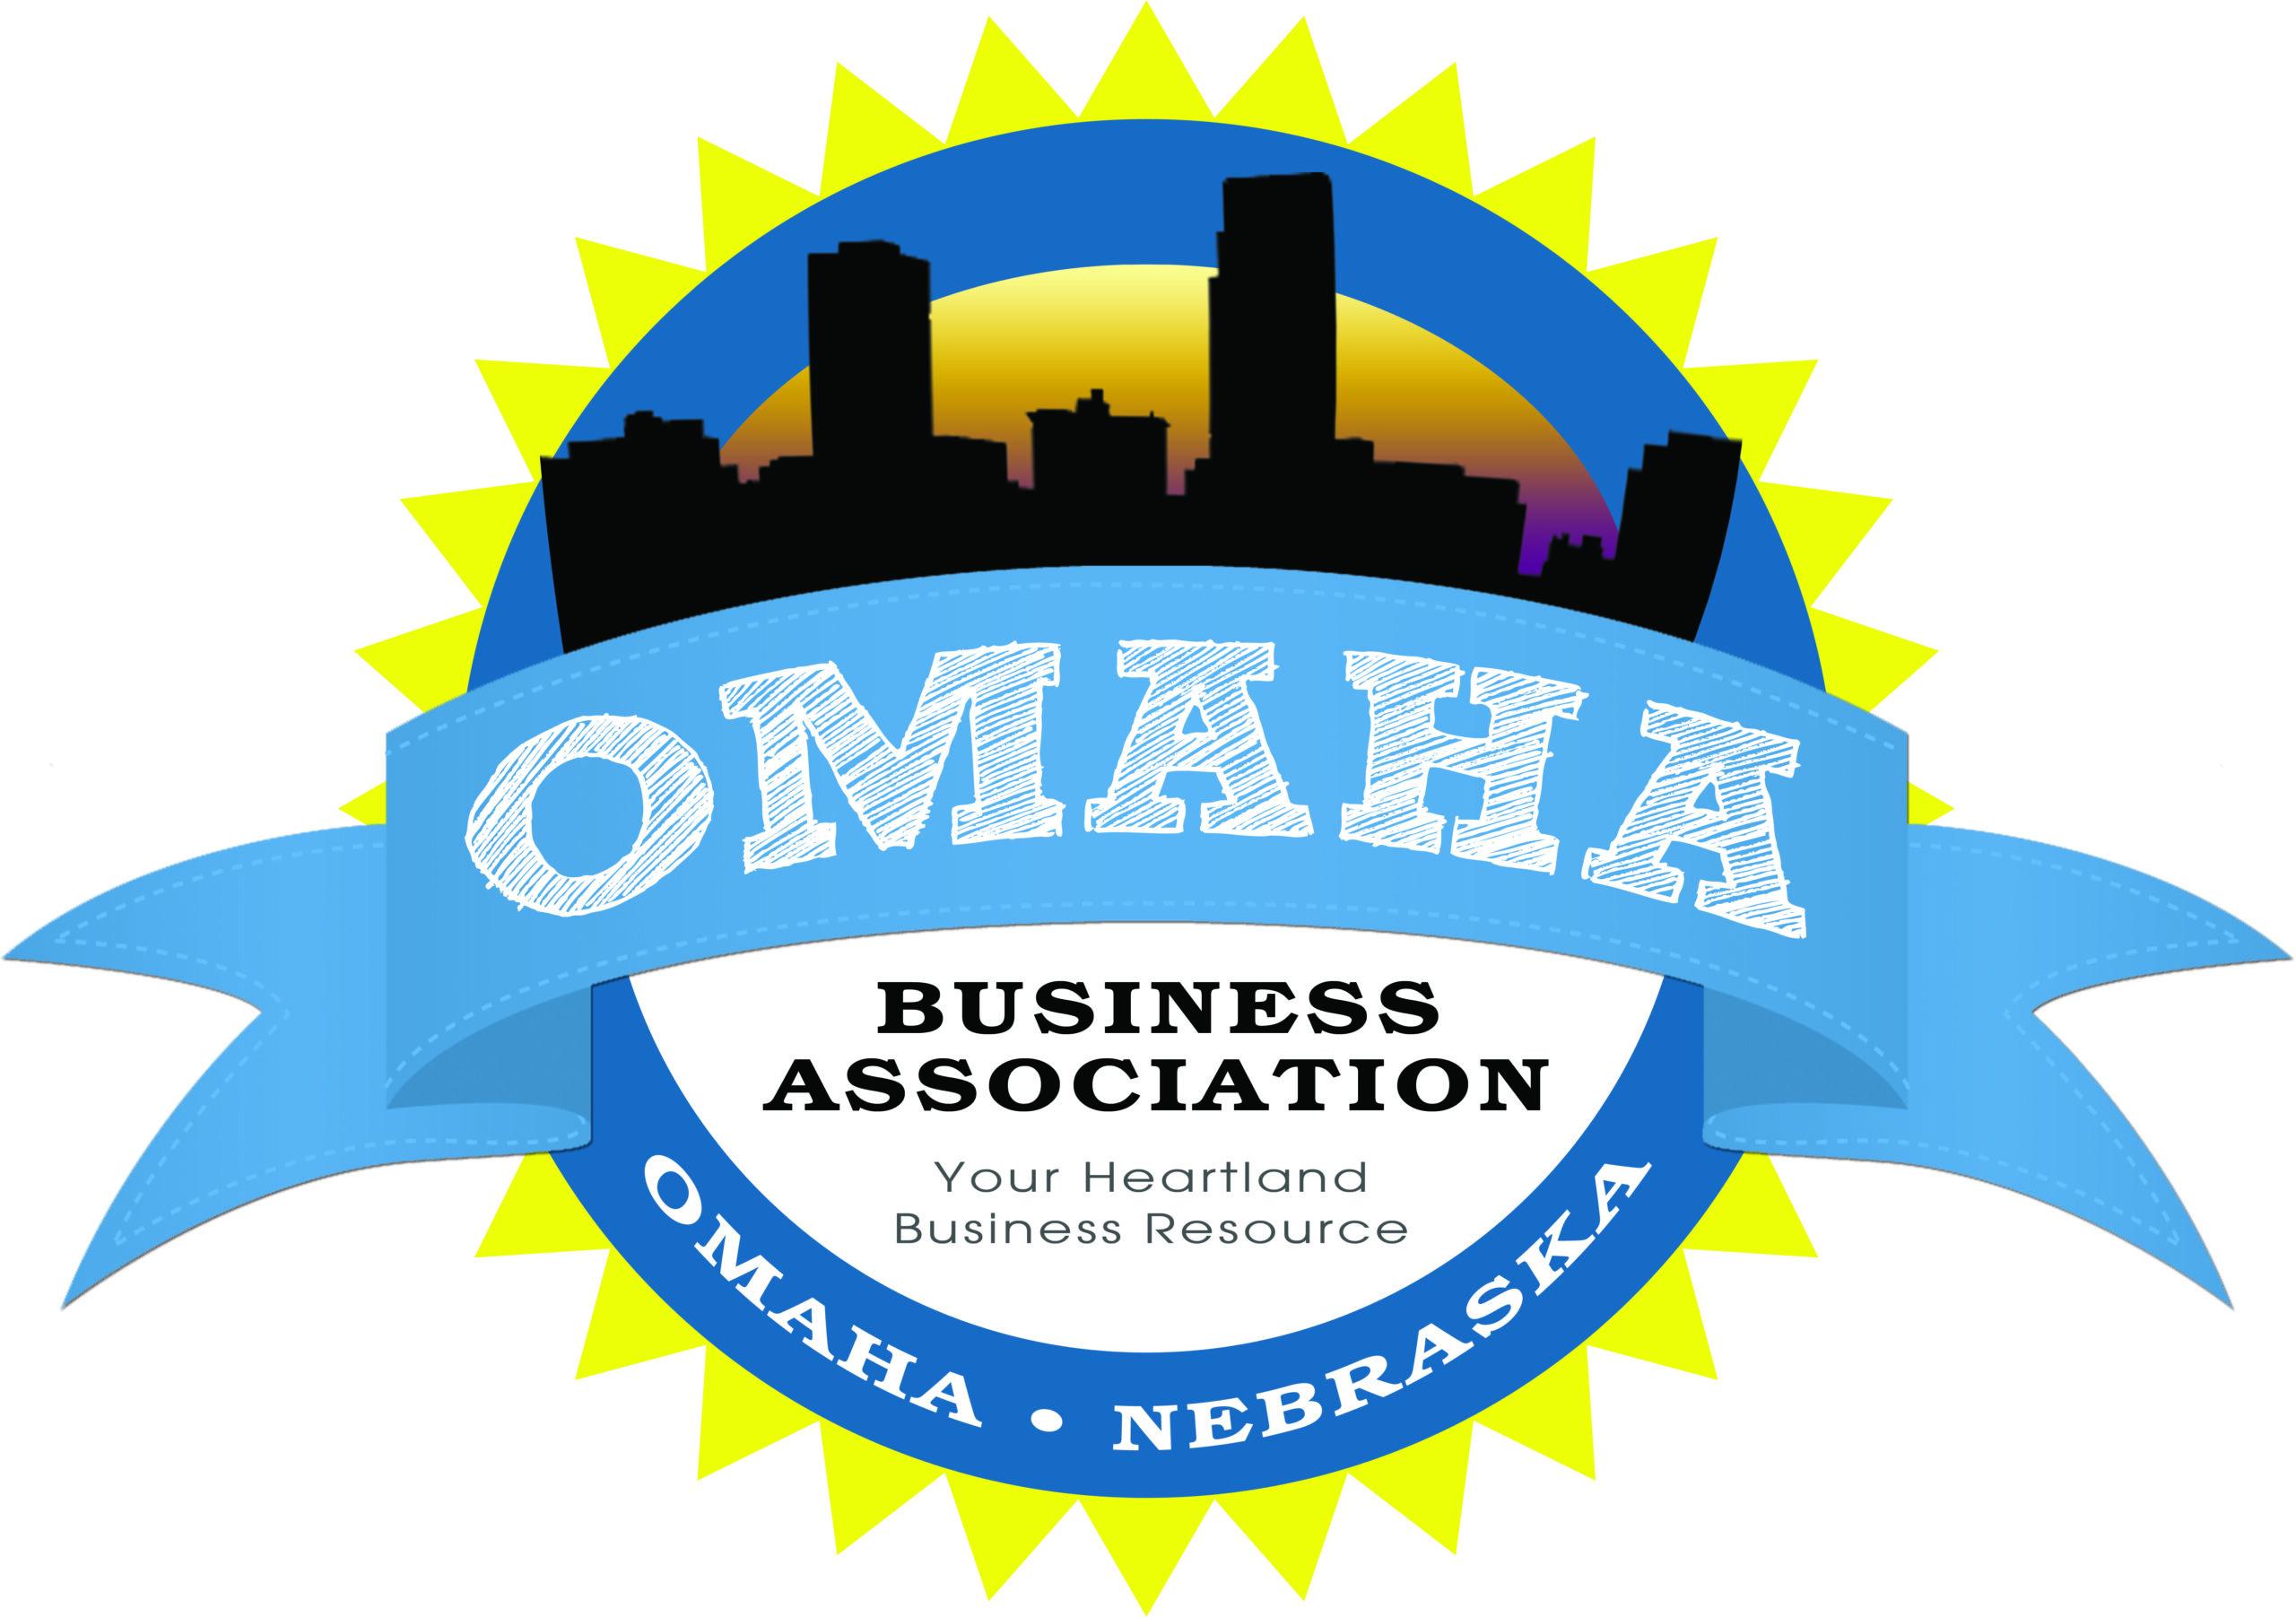 Omaha Business Association